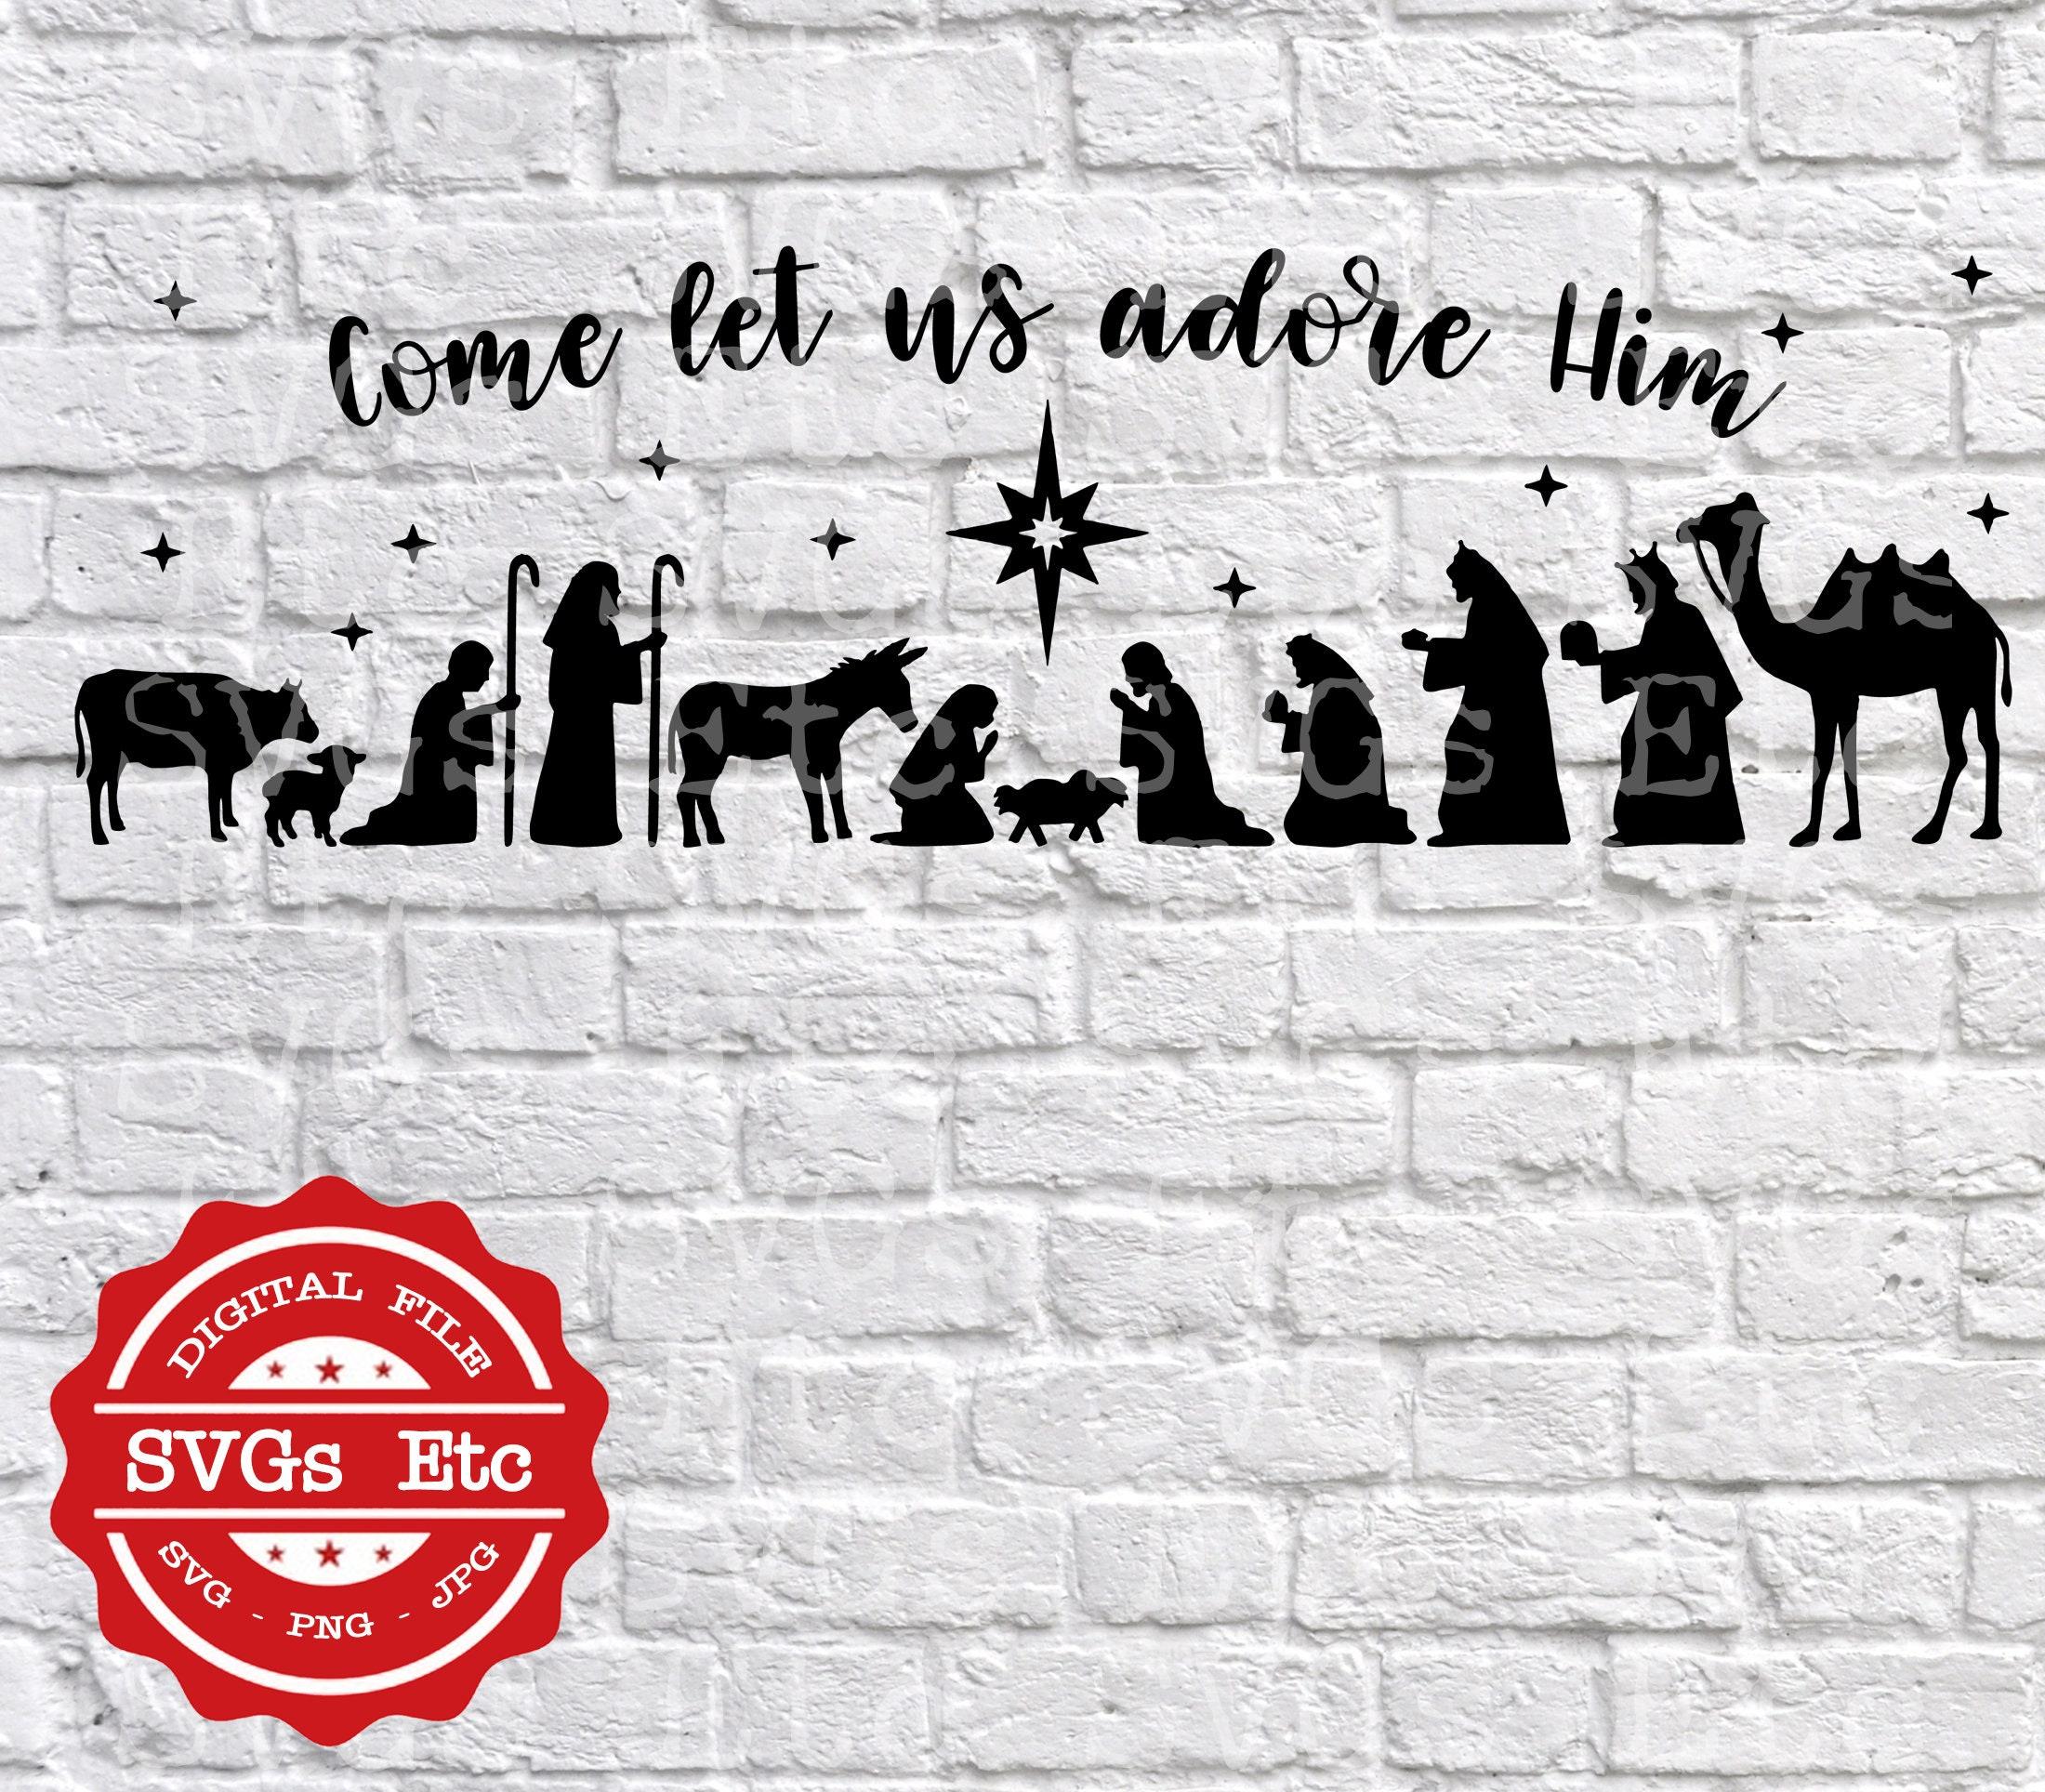 e Let Us Adore Him Nativity Christmas SVG PNG JPG